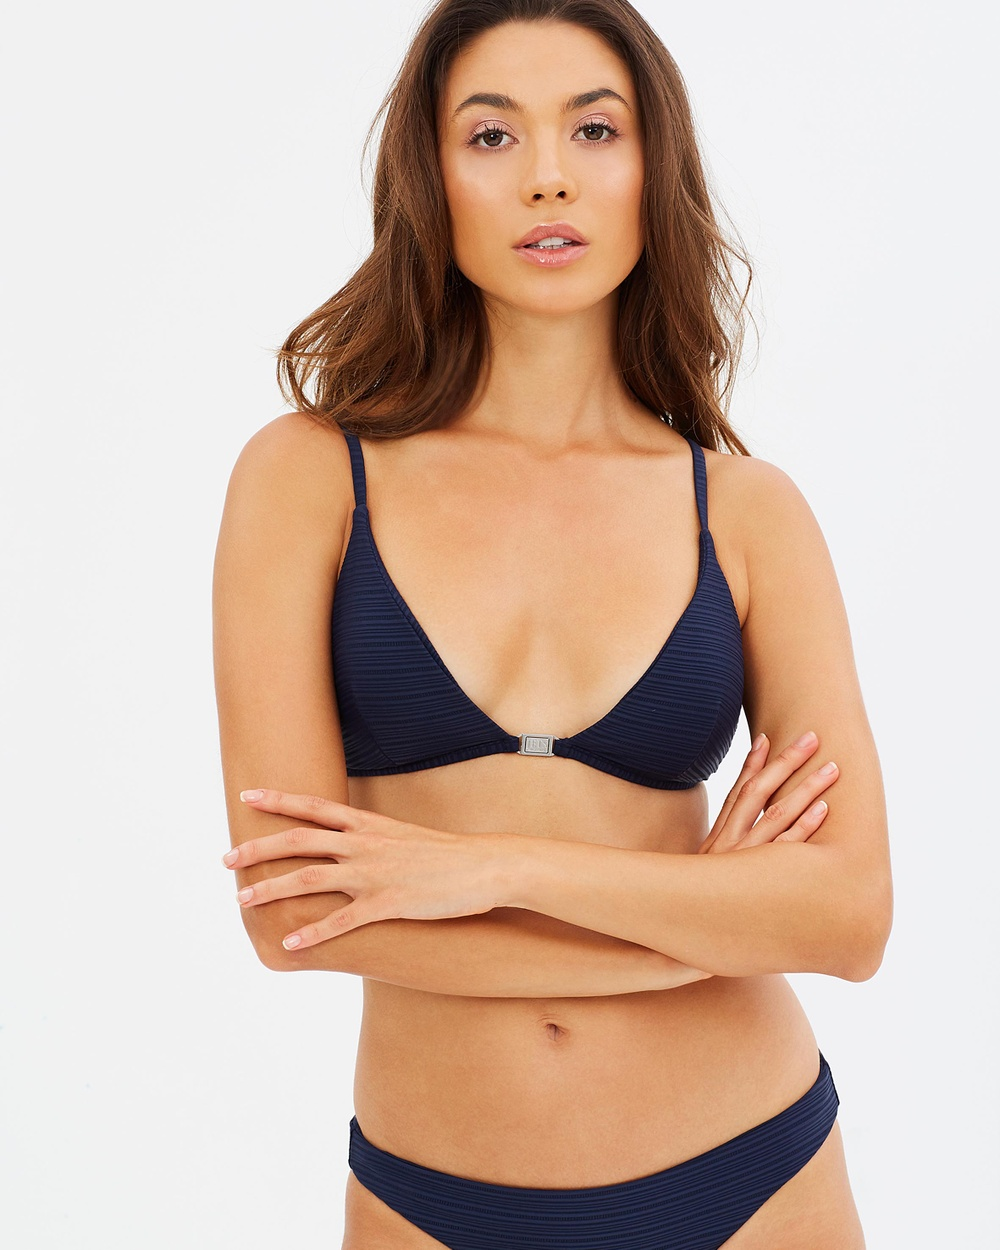 JETS Triangle Top Bikini Tops Navy Triangle Top